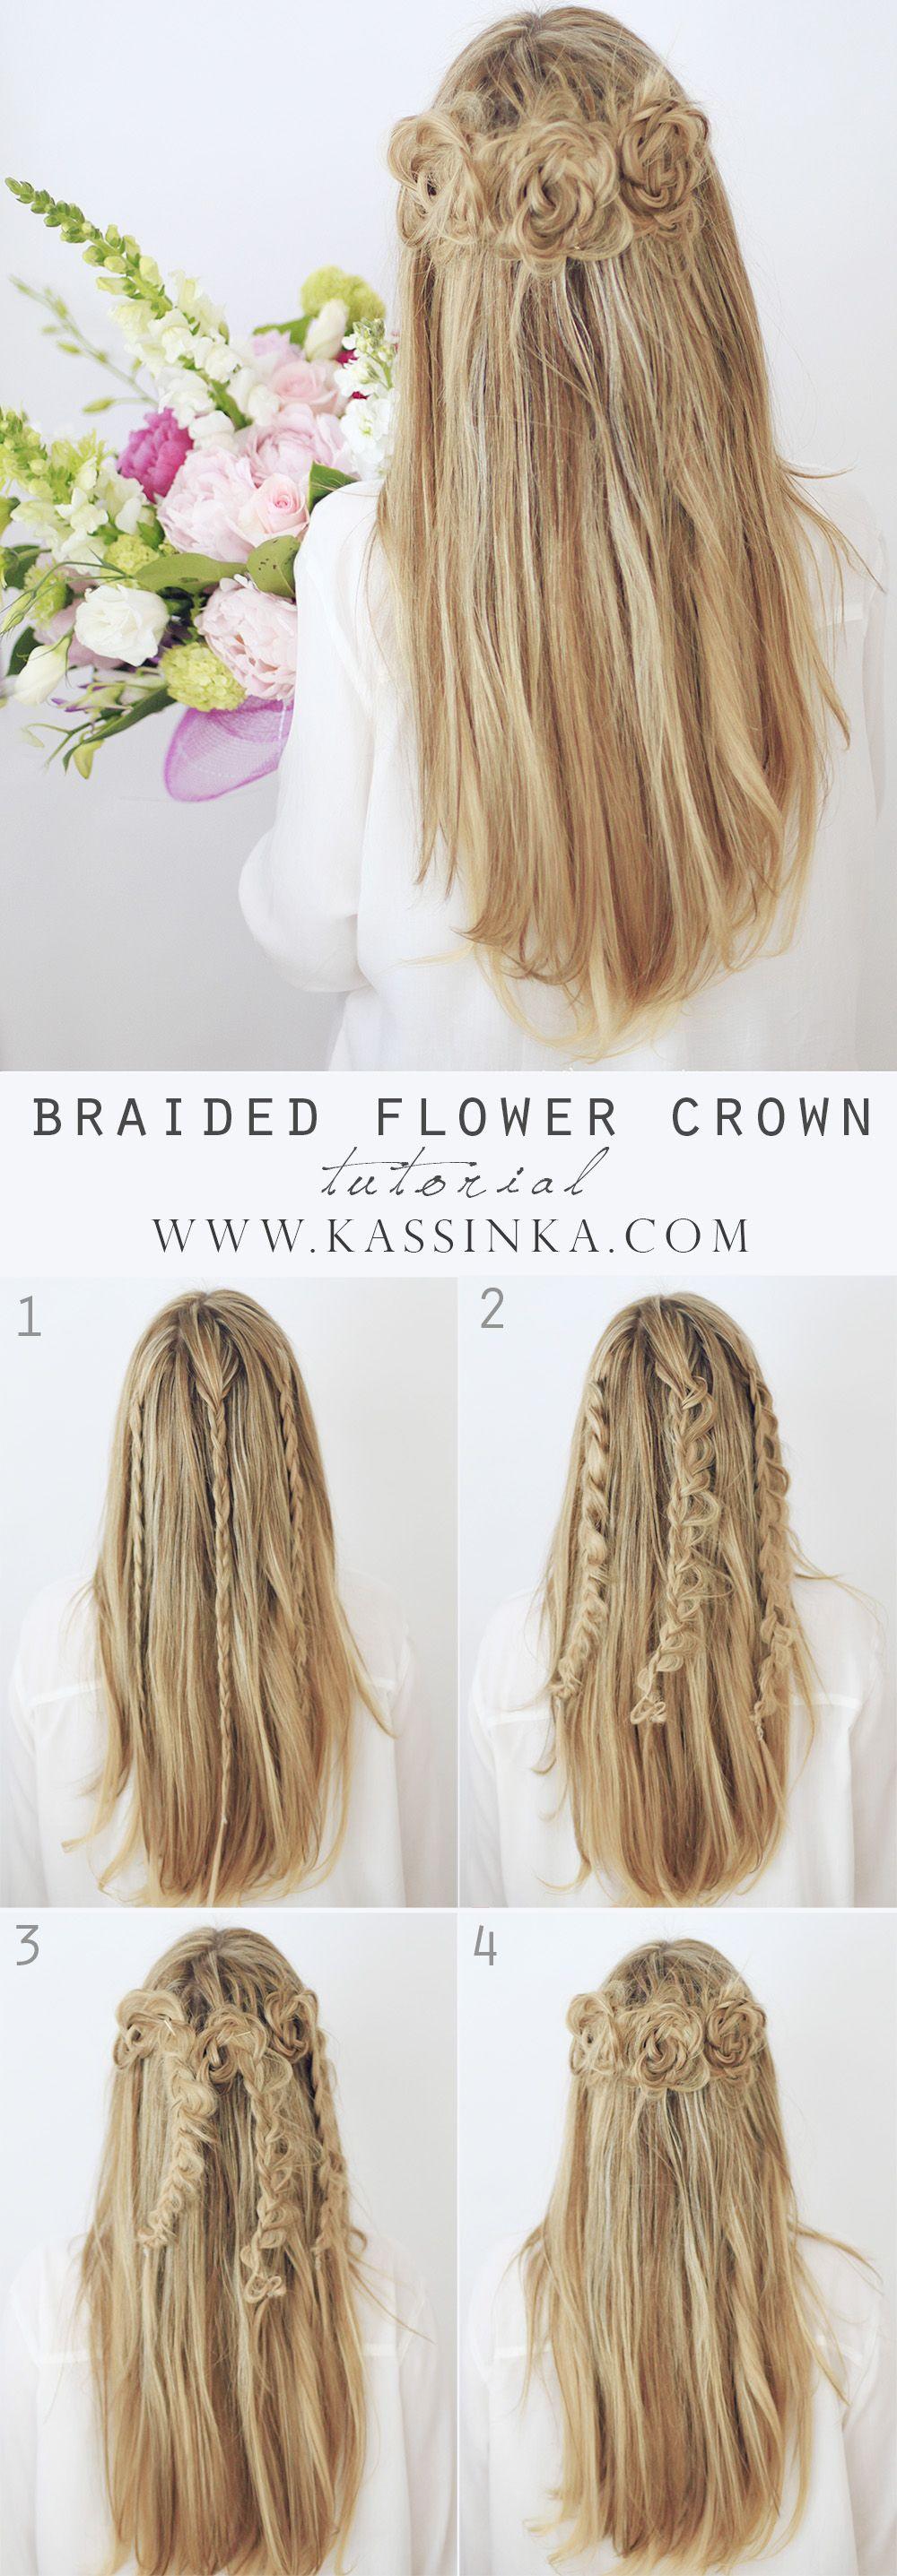 braided flower crown hair tutorial fancy half up hairstyles party ...